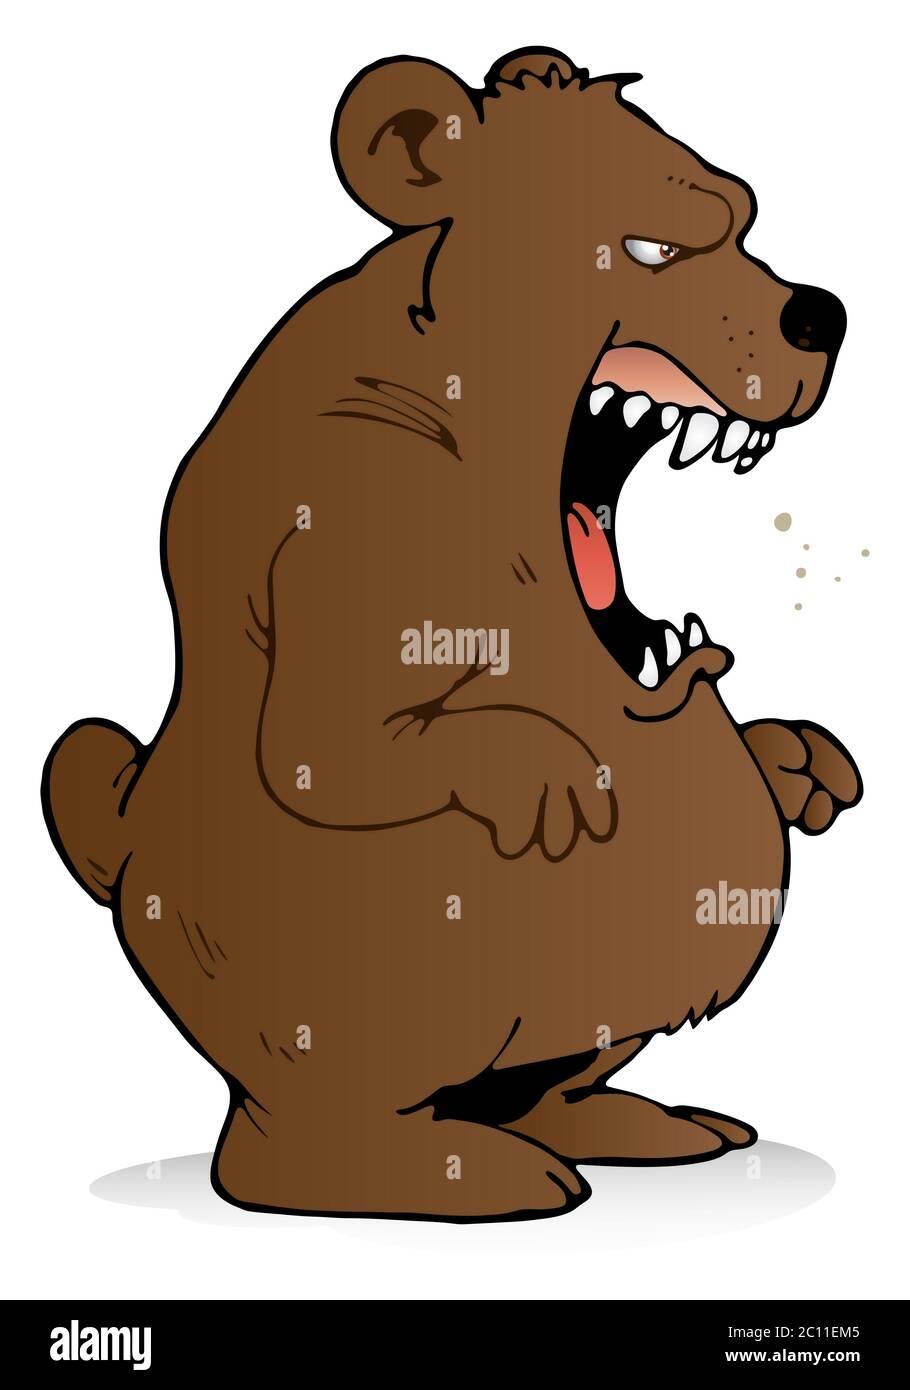 Vector Illustration - Scary bear. EPS Clipart gg61136276 - GoGraph